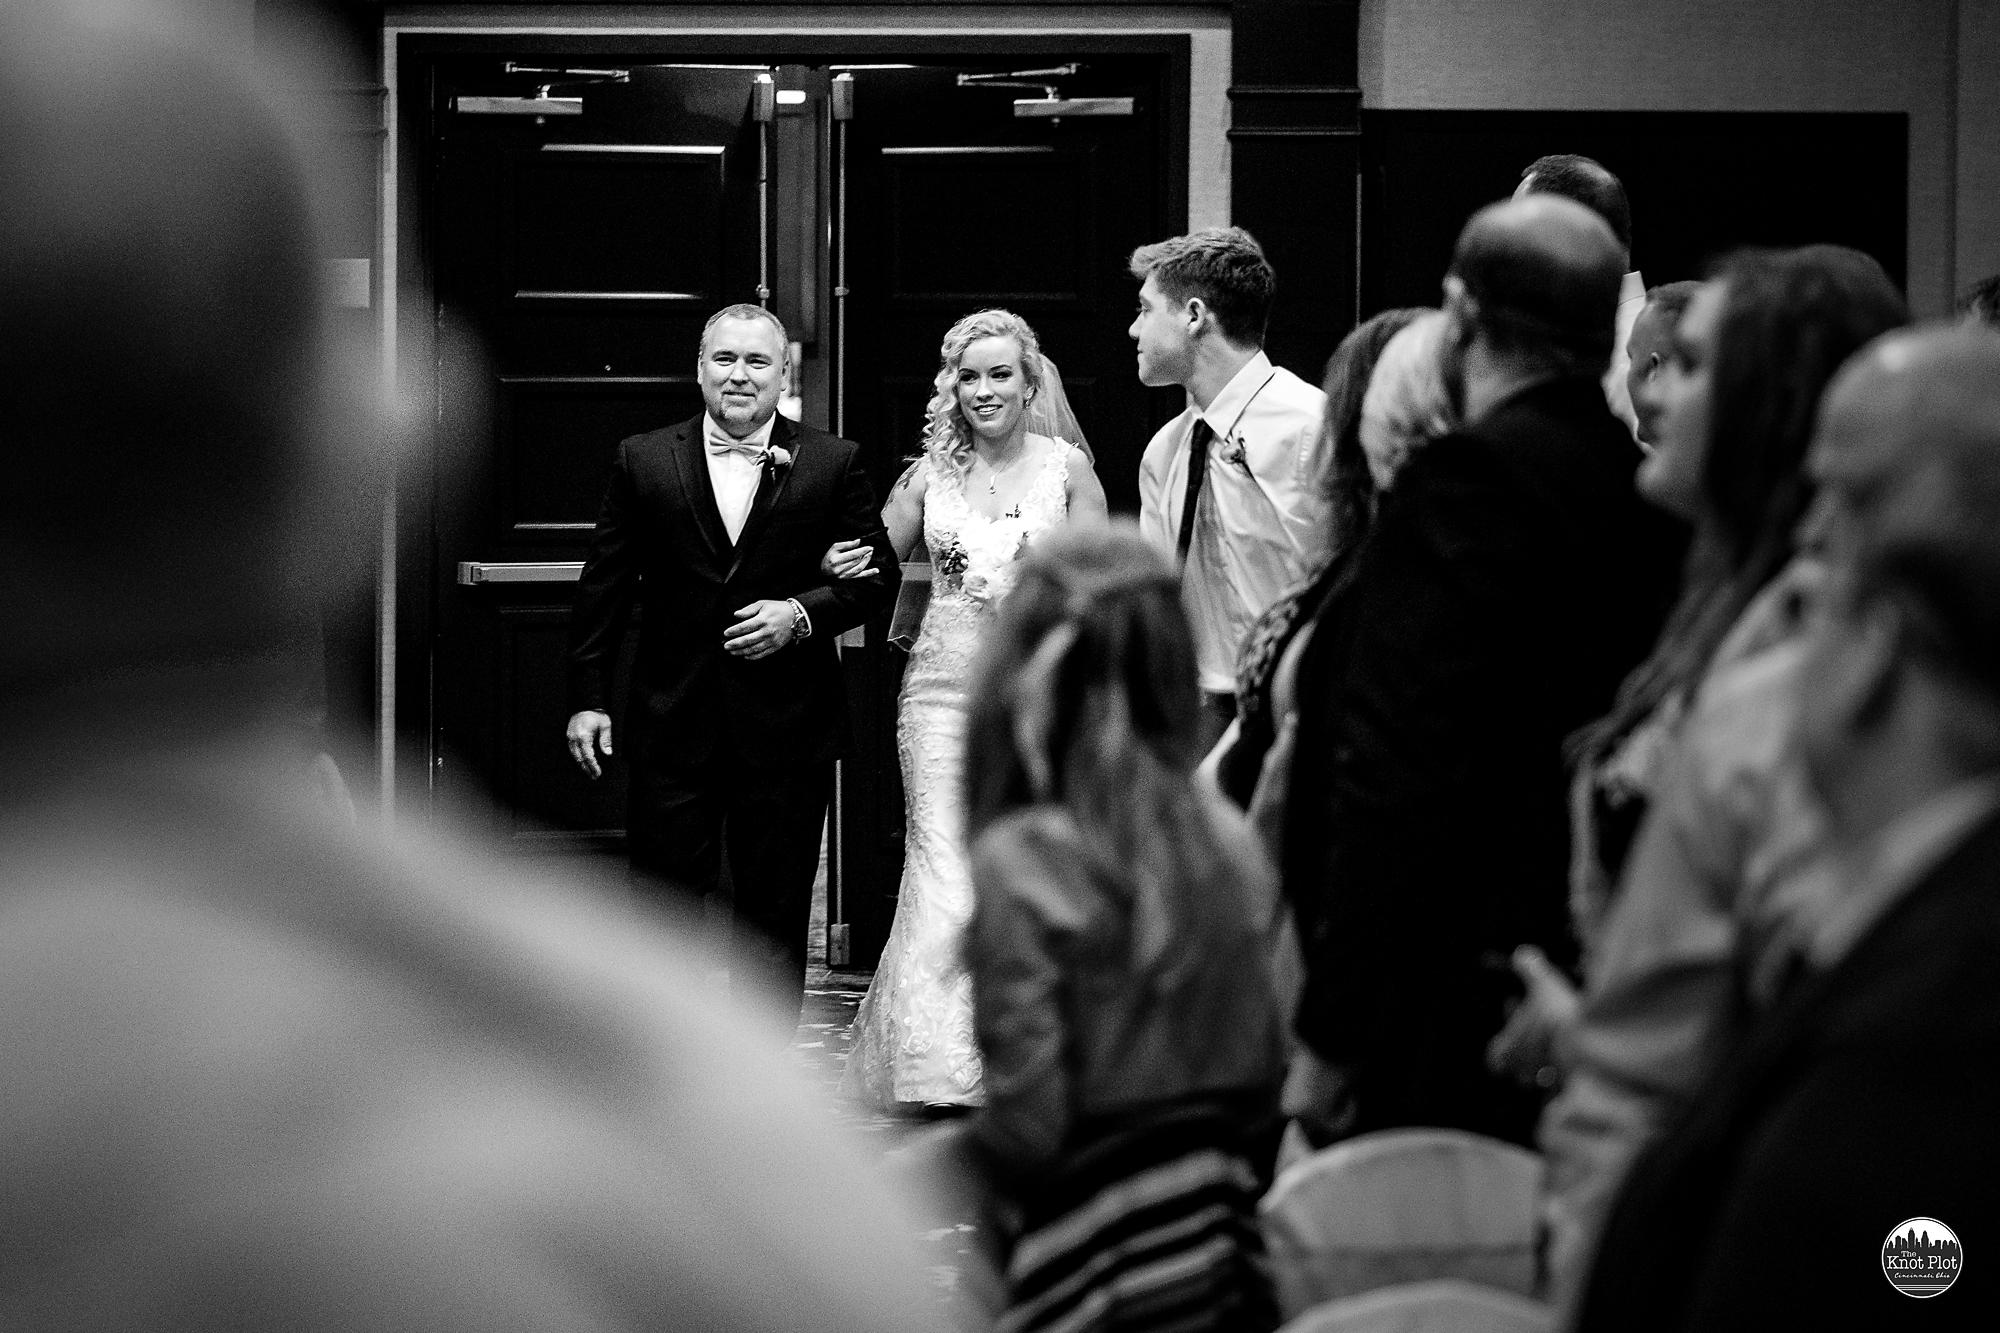 Embassy-Suites-Rivercenter-Cincinnati-Wedding-Photography-13.jpg